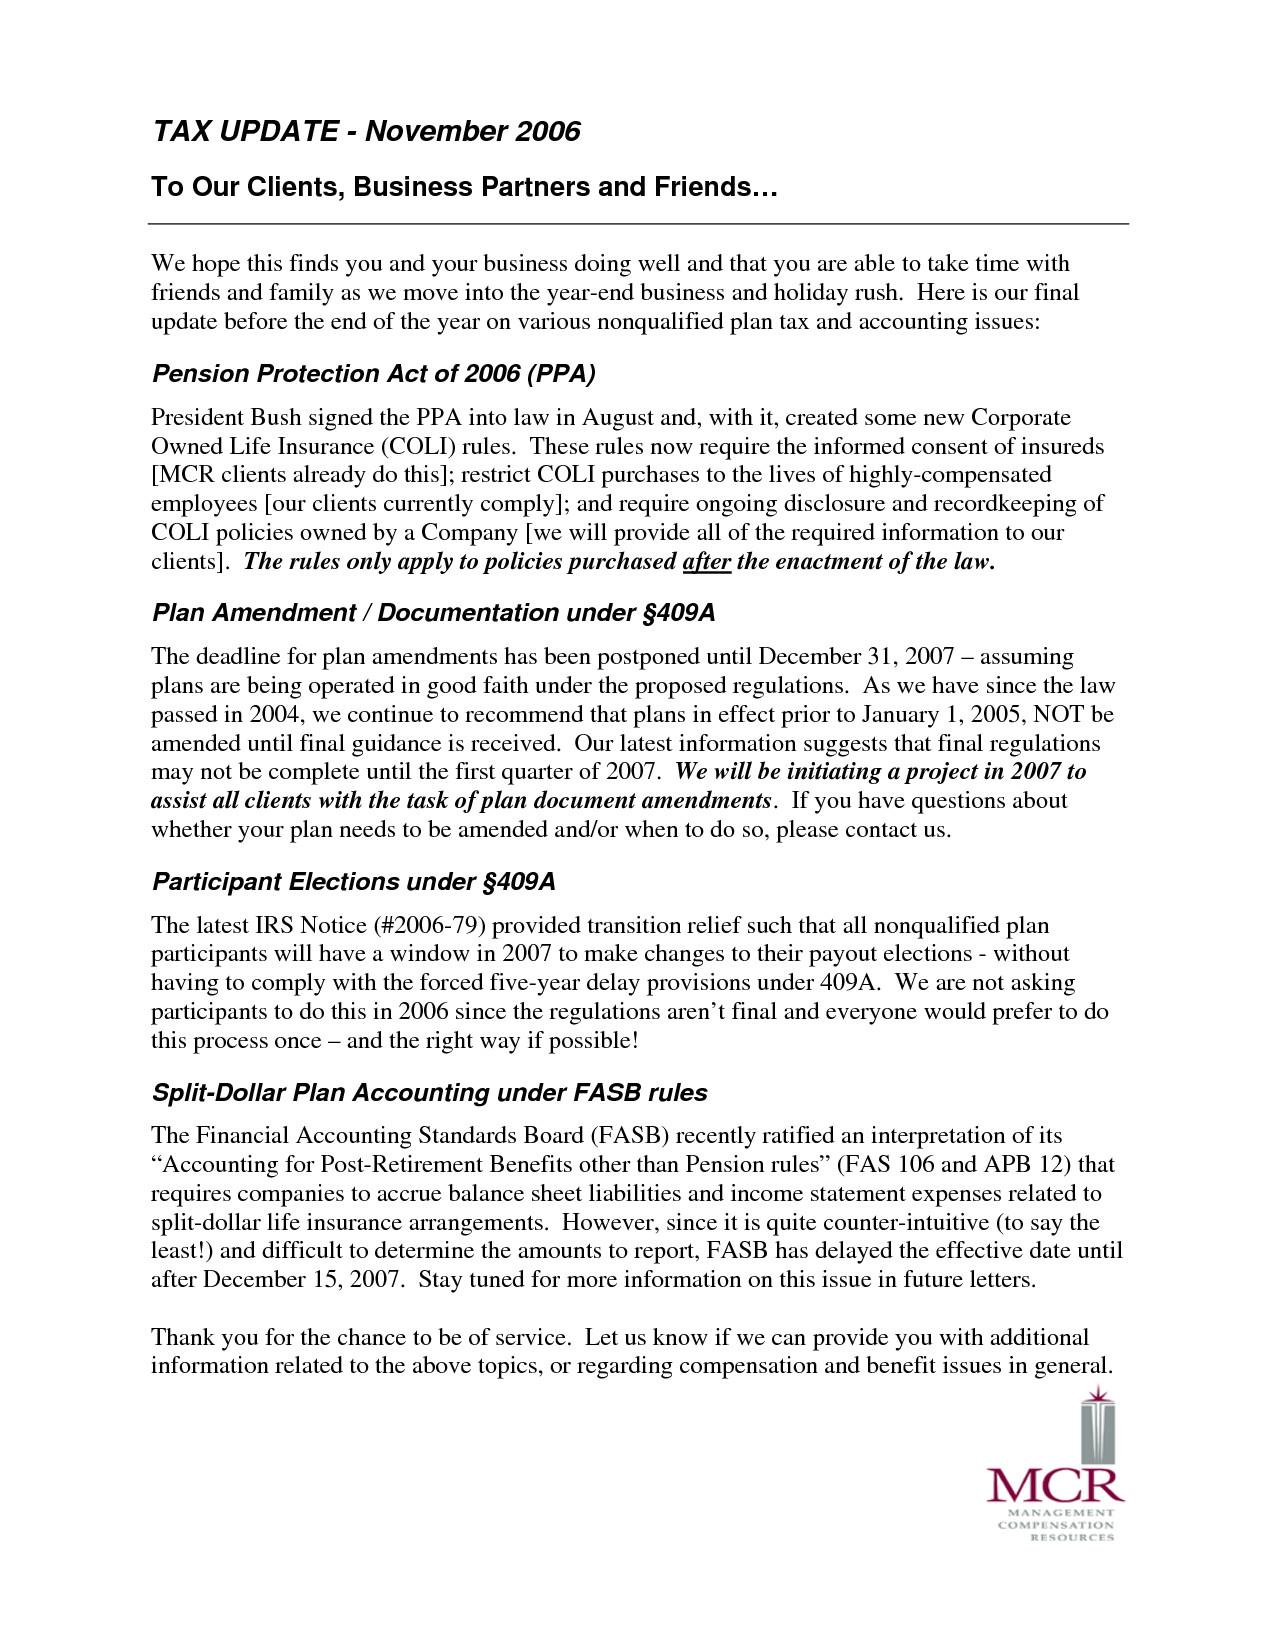 accounting memo template